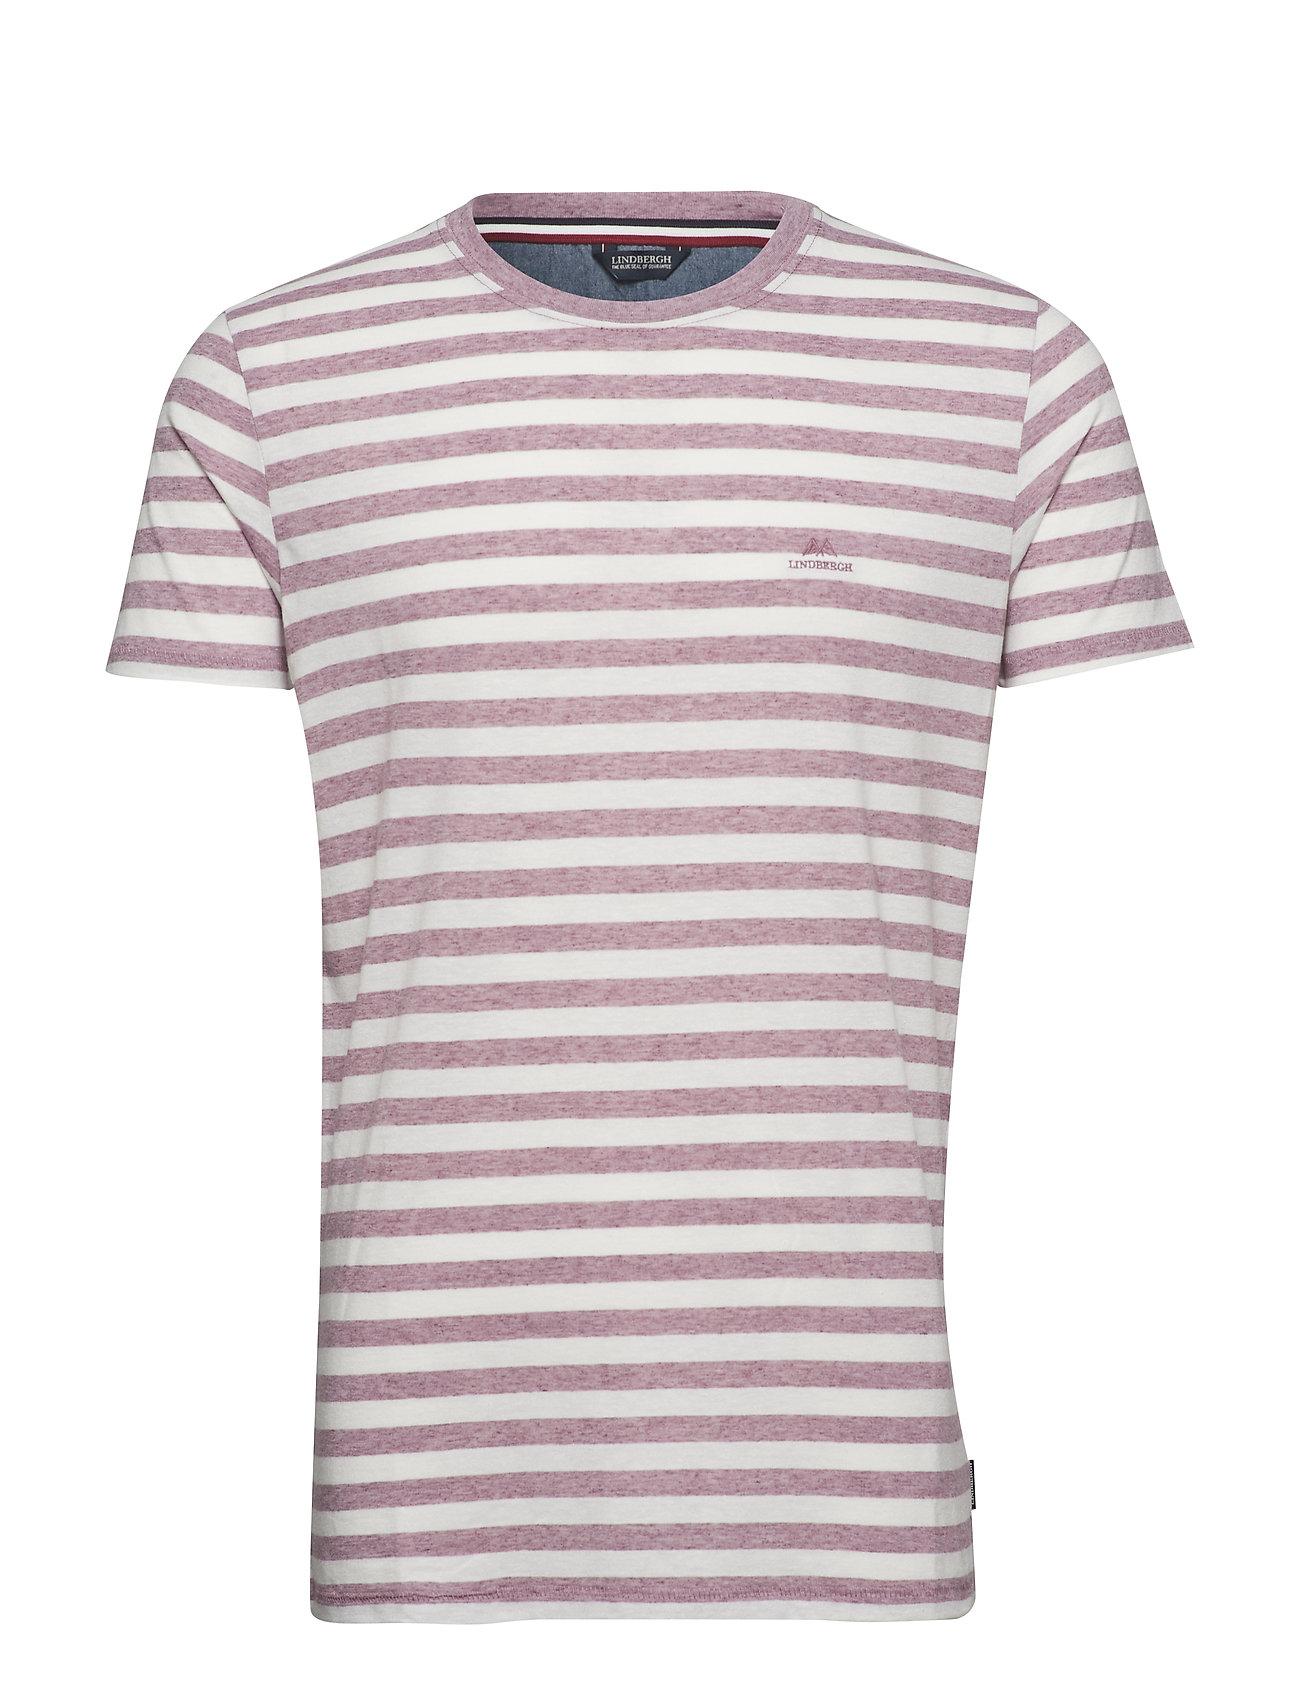 S spurpleLindbergh Striped Striped Slub Tee c3R54LqAj